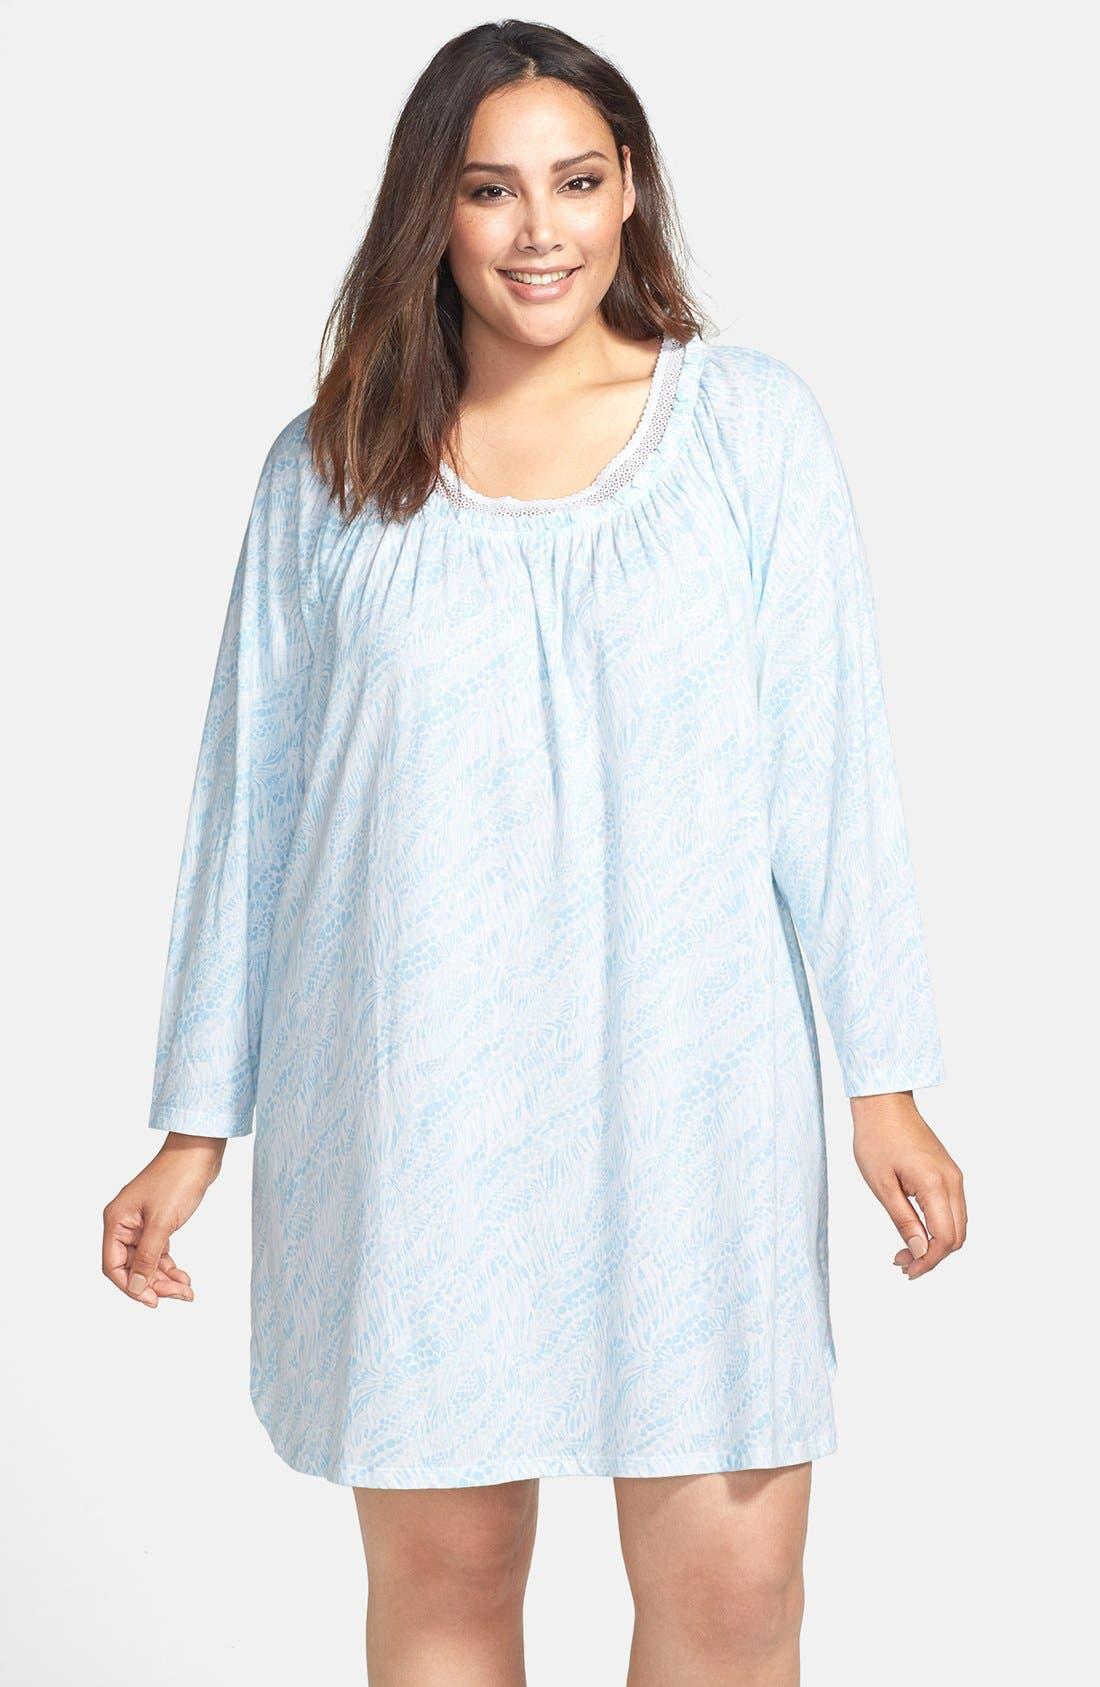 Alternate Image 1 Selected - Carole Hochman Designs 'Wistful Rosebud' Sleep Shirt (Plus Size)